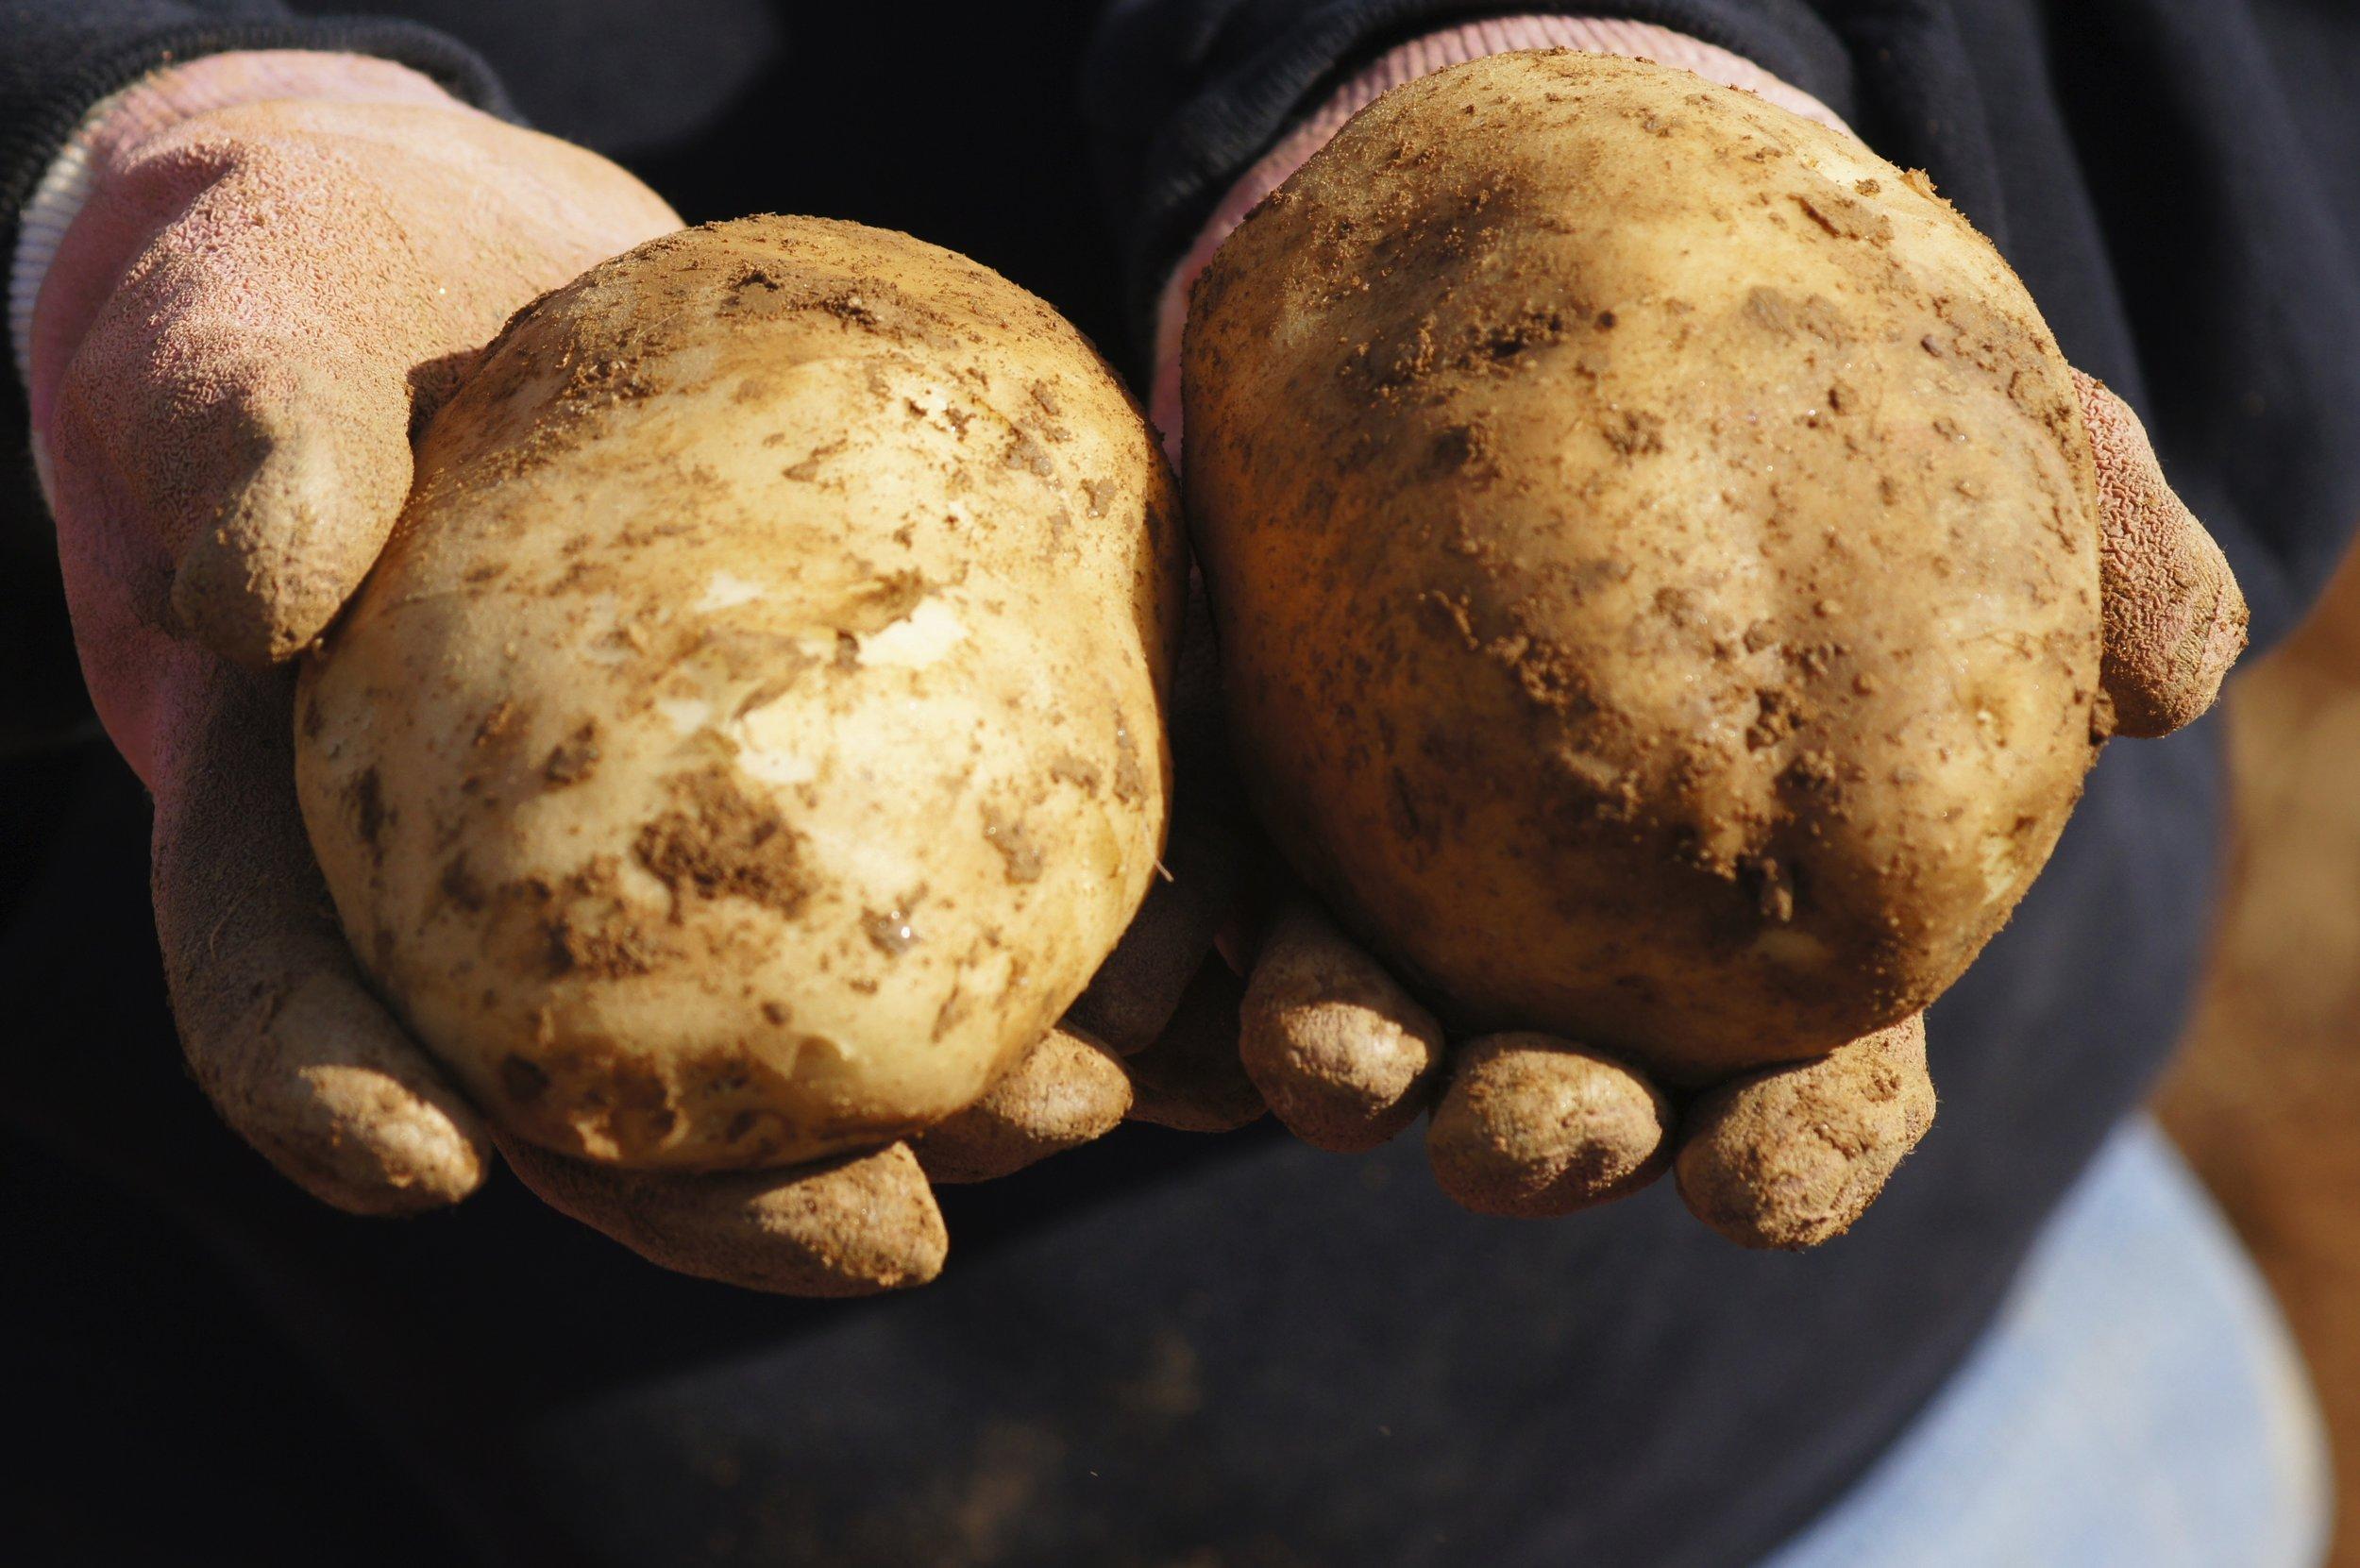 potatoes after harvest